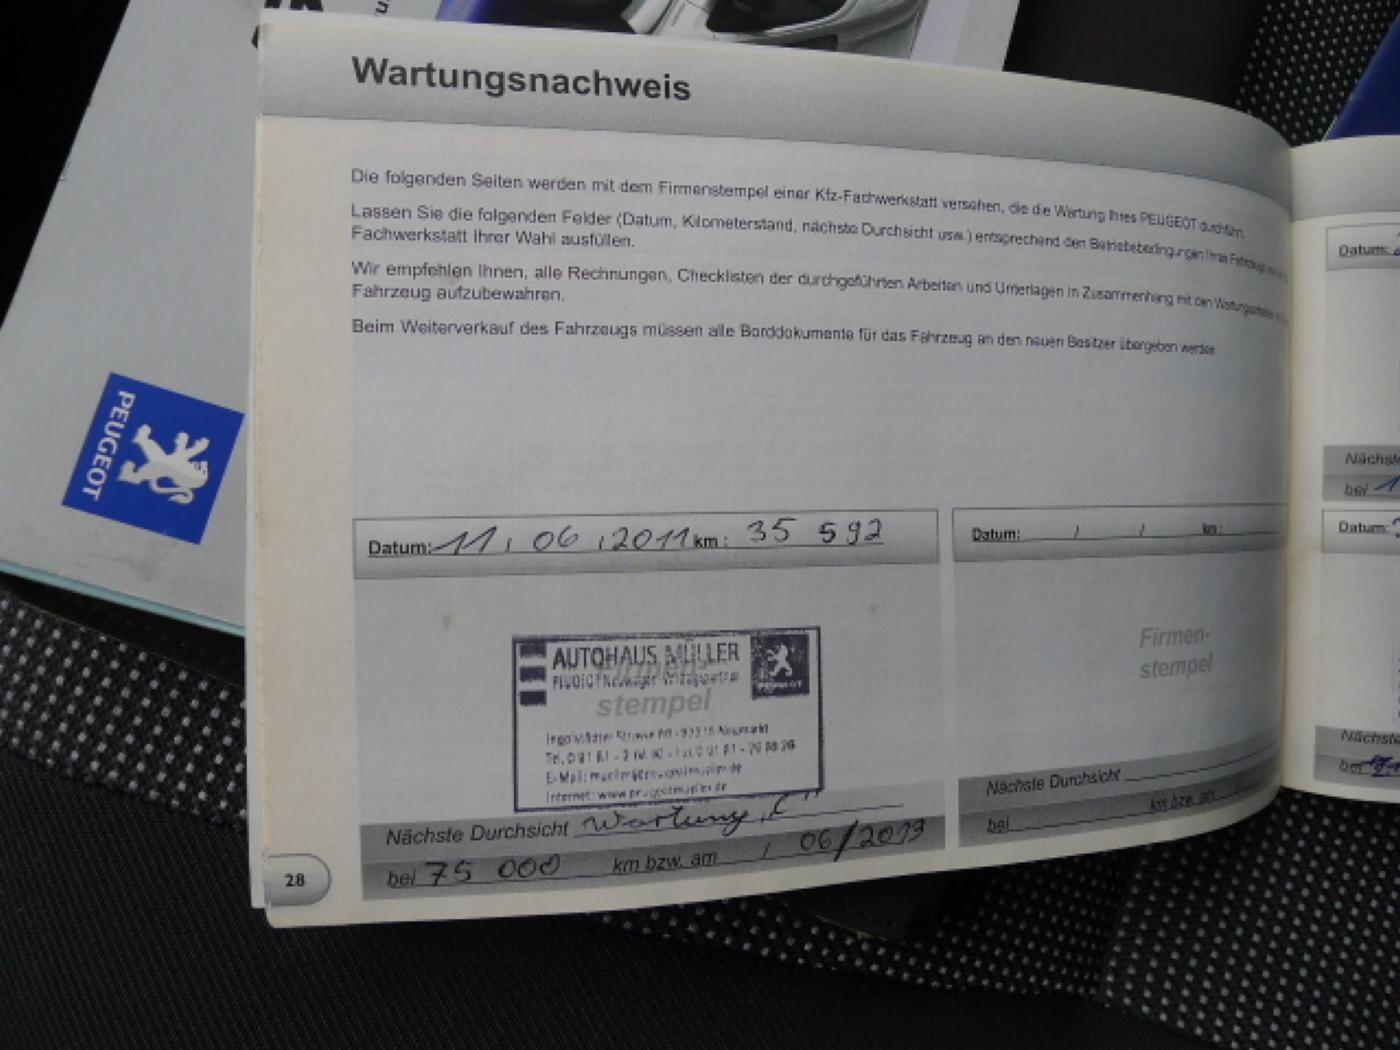 Peugeot Boxer 2.2 HDI L2H2 Klima Akce!!! Novinka - 16